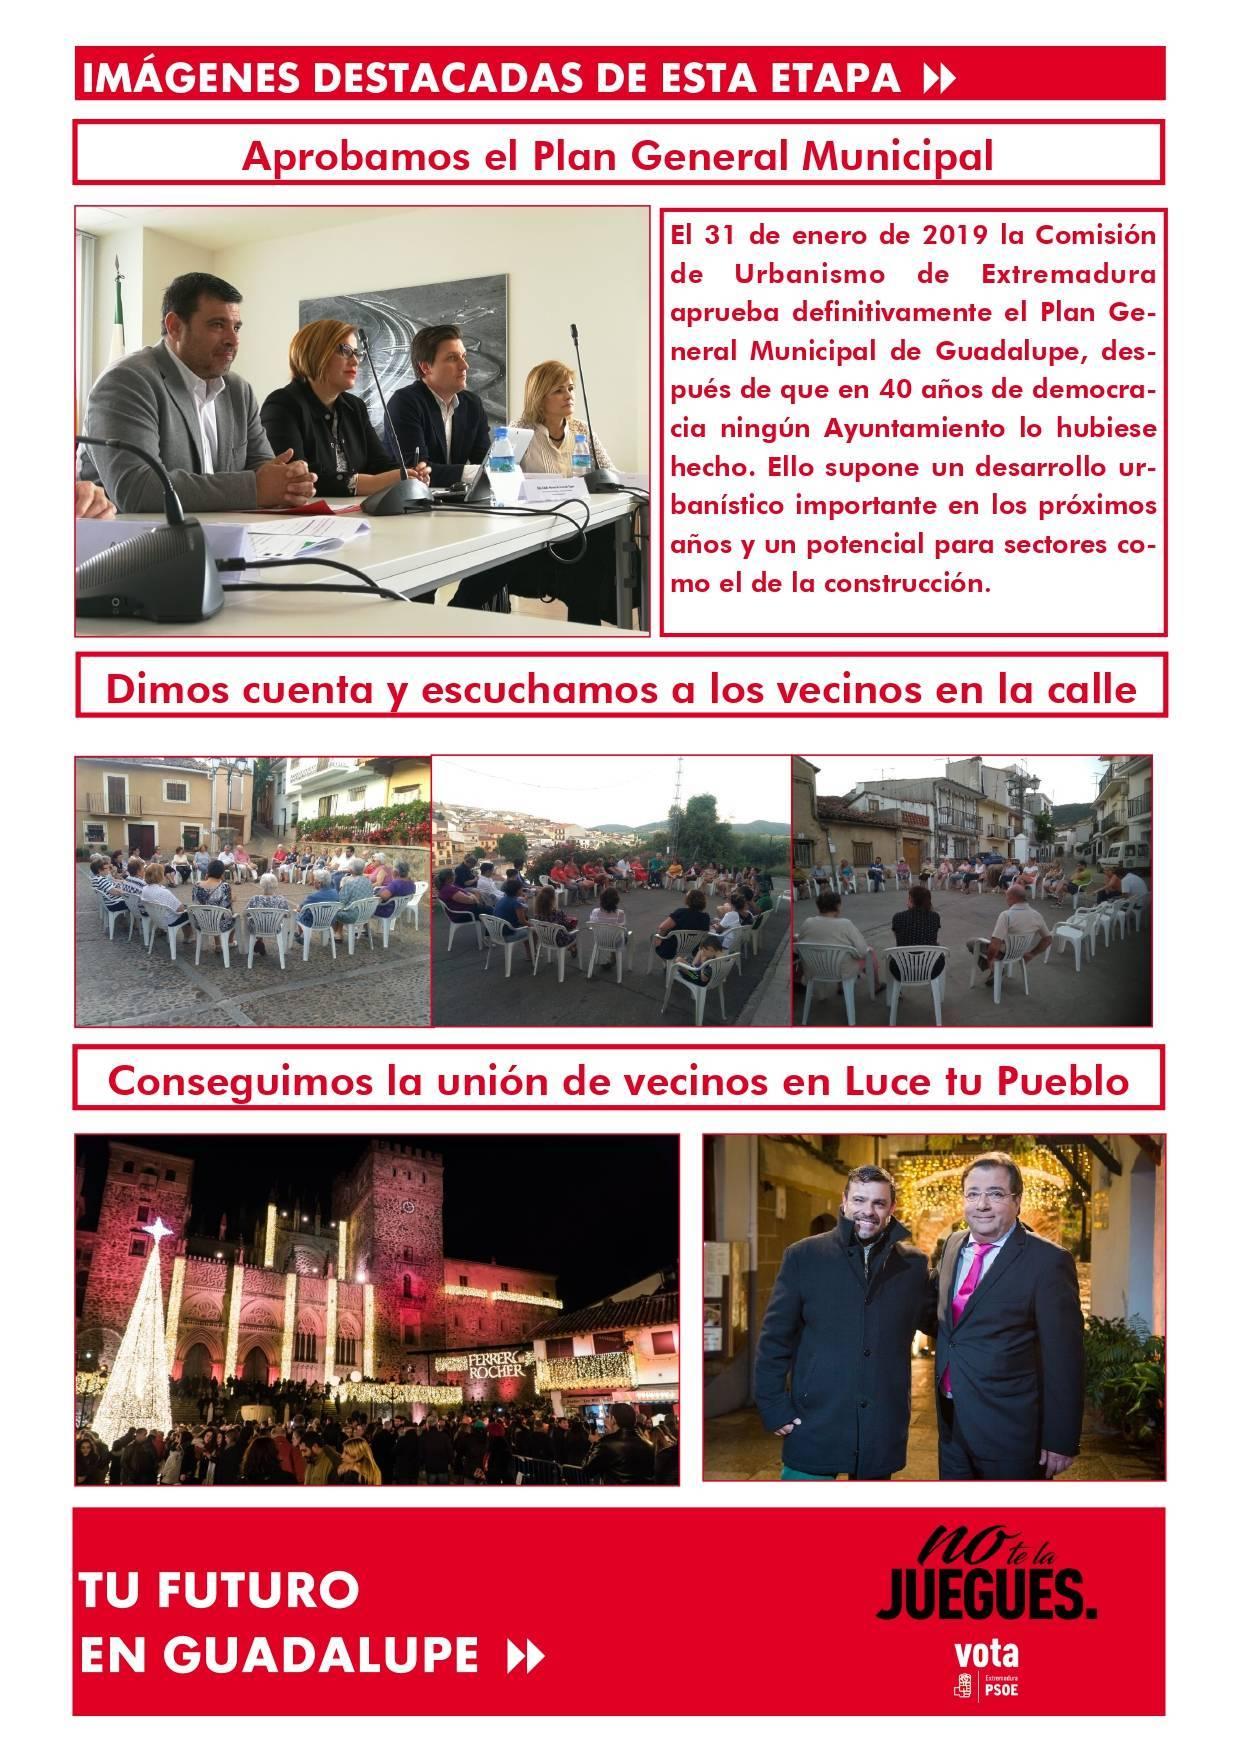 Boletín informativo de gestión municipal 2015-2019 - Guadalupe (Cáceres) 12